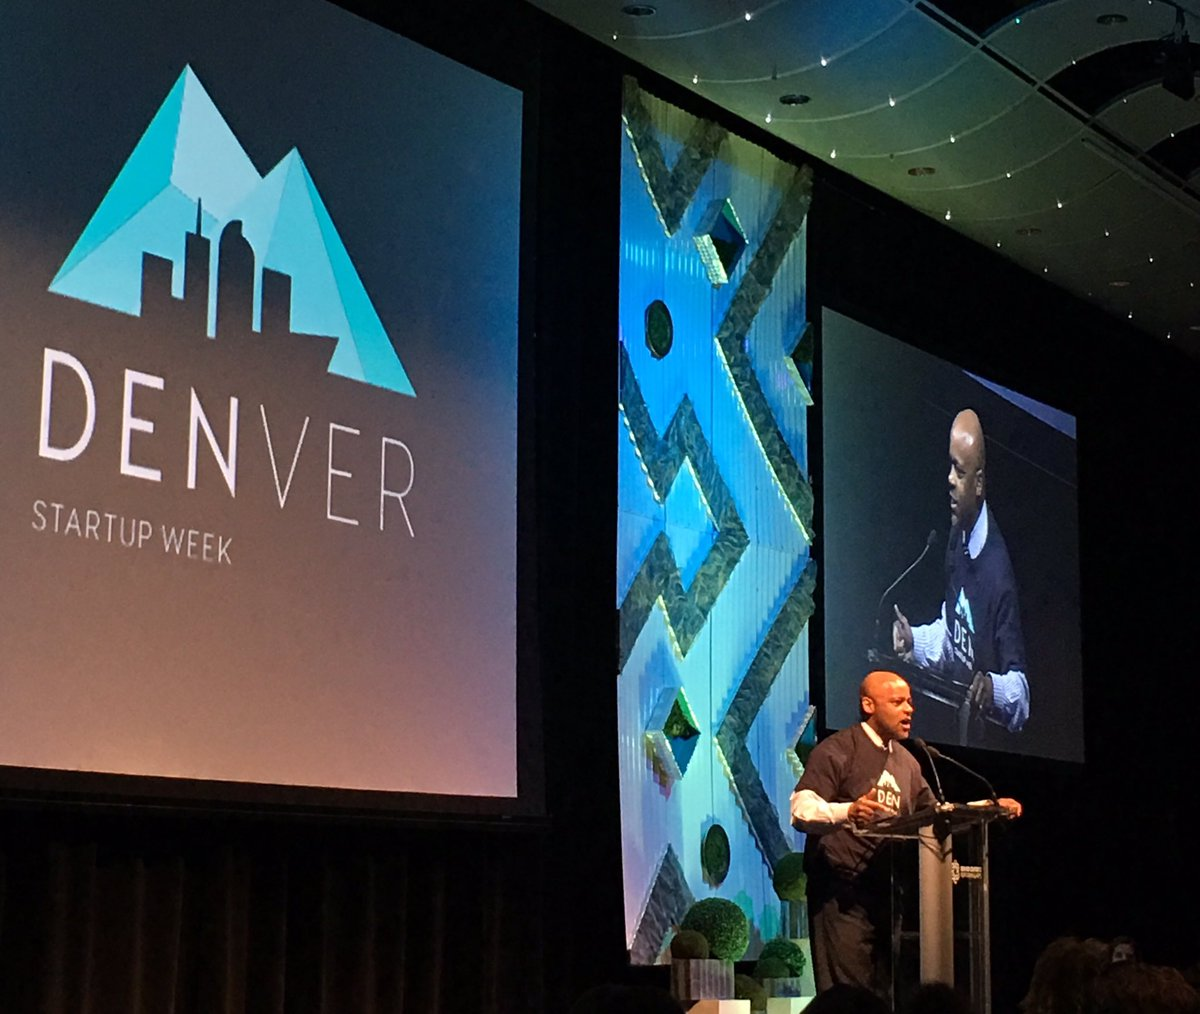 Denver Startup Week Kicks Off Schedule Of More Than 250 Events